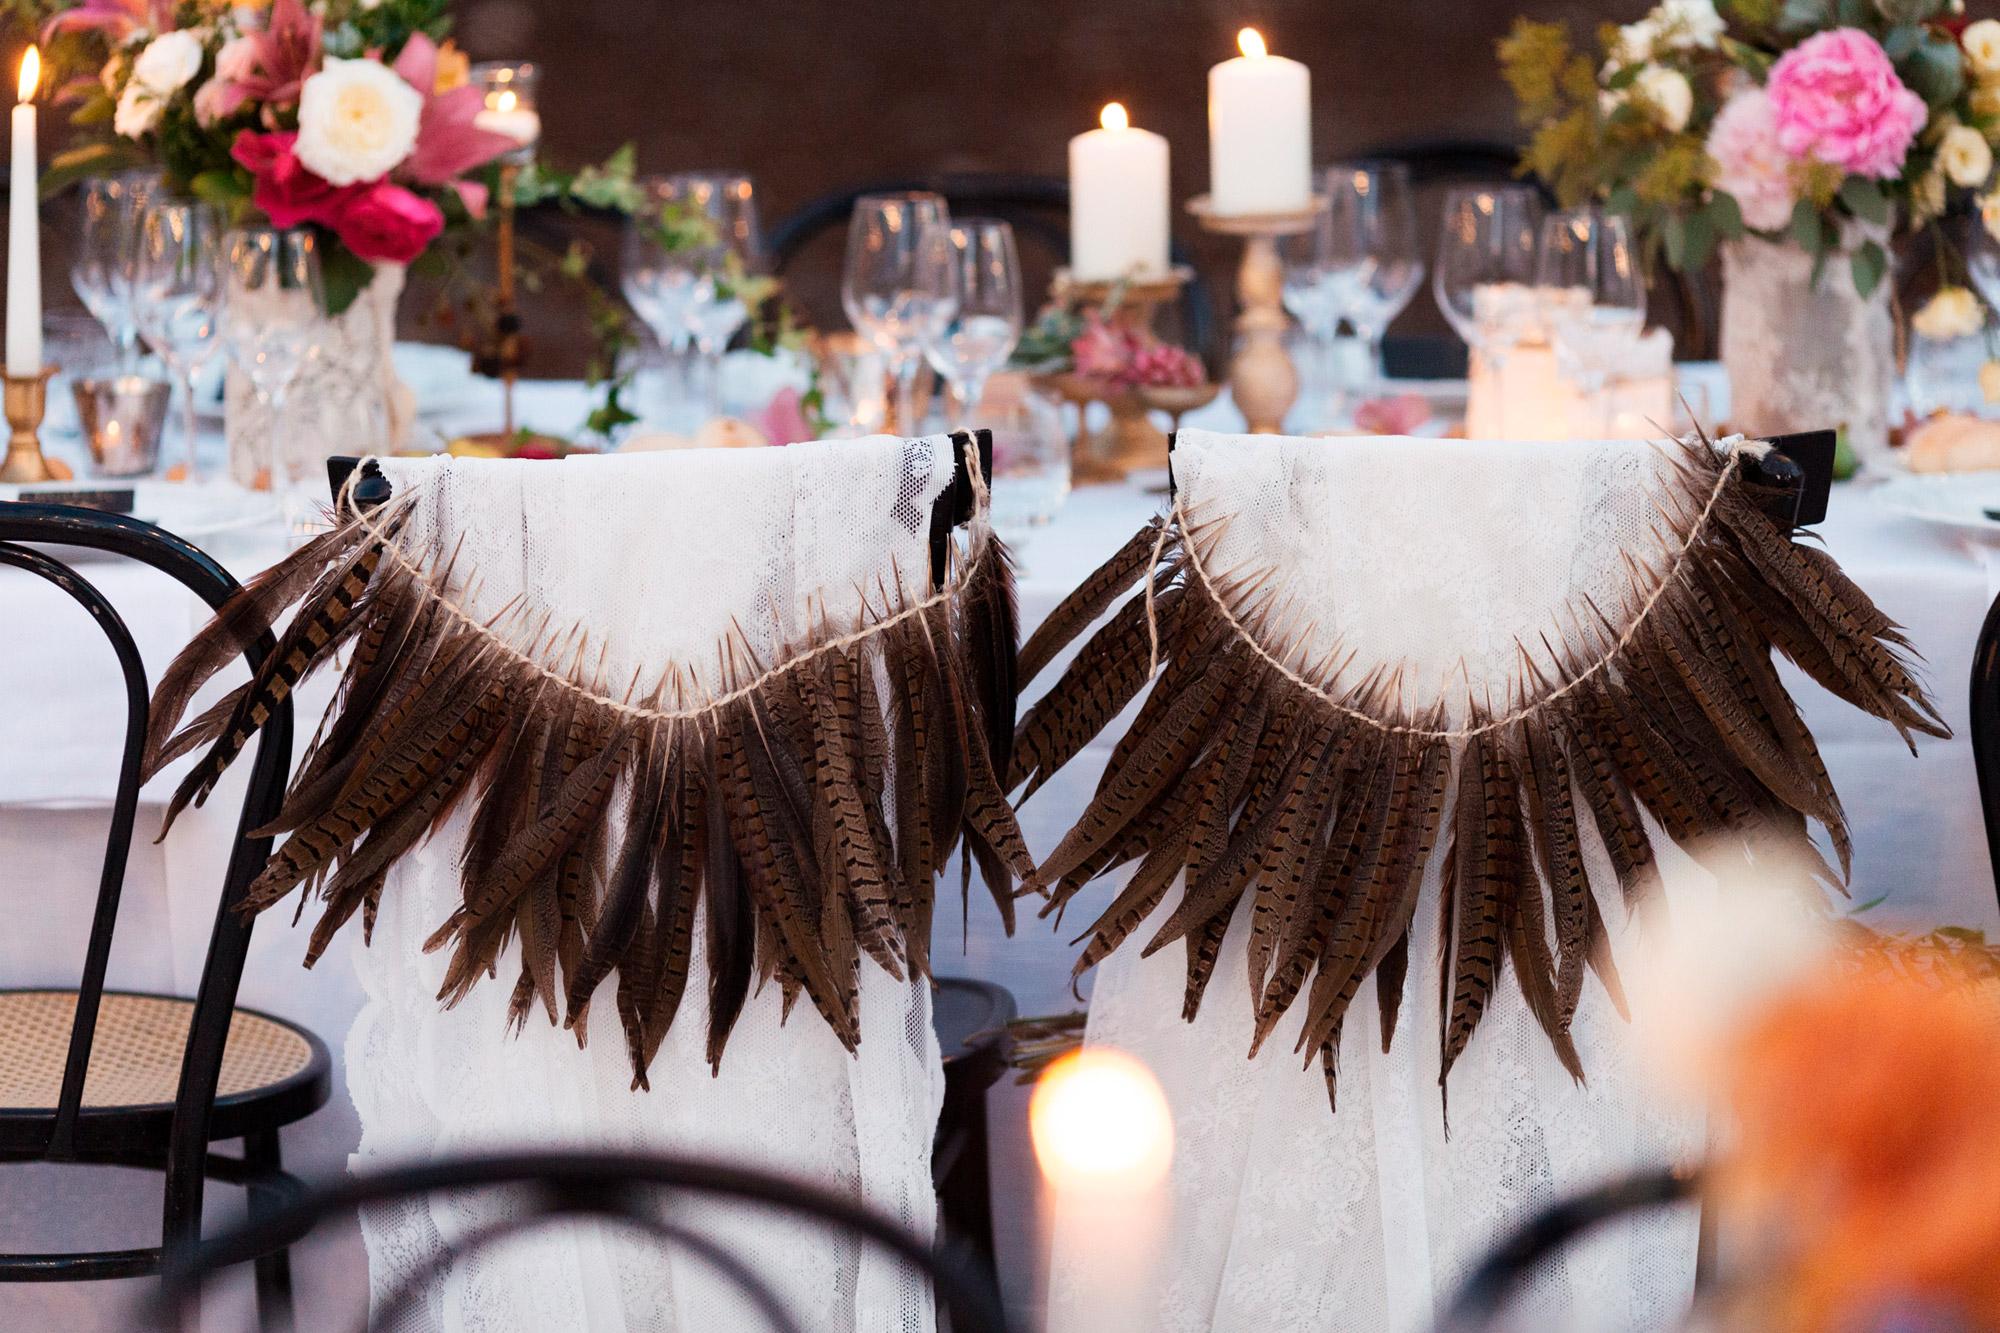 230-FIKUS-PUGLIA-wedding-ostuni-masseria.jpg